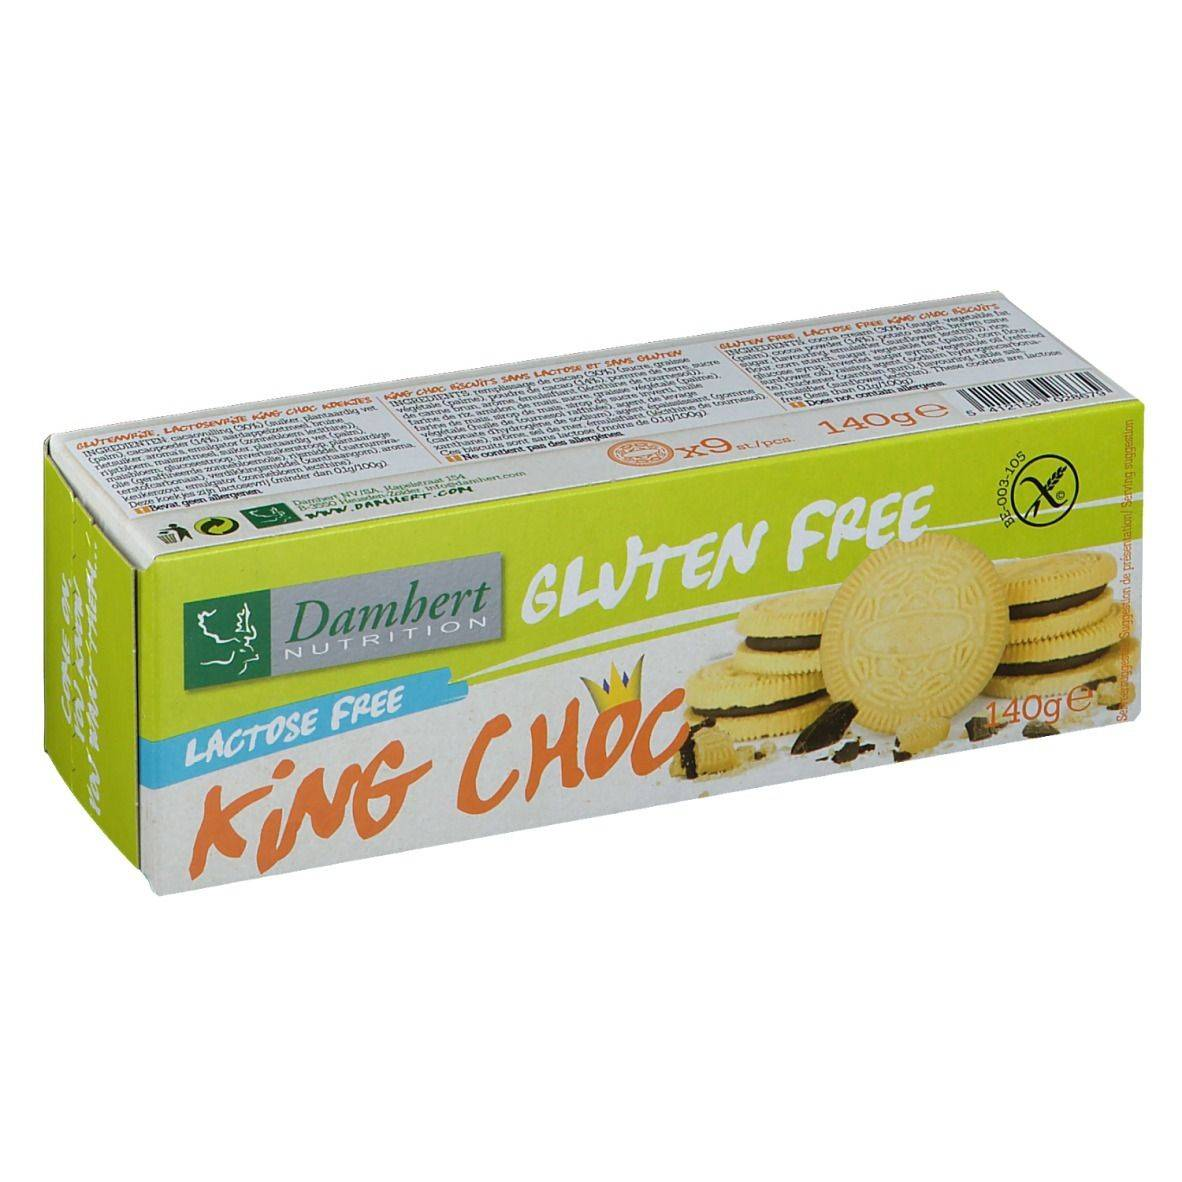 Damhert Gluten Free King Choc biscuits sans lactose g biscuit(s)